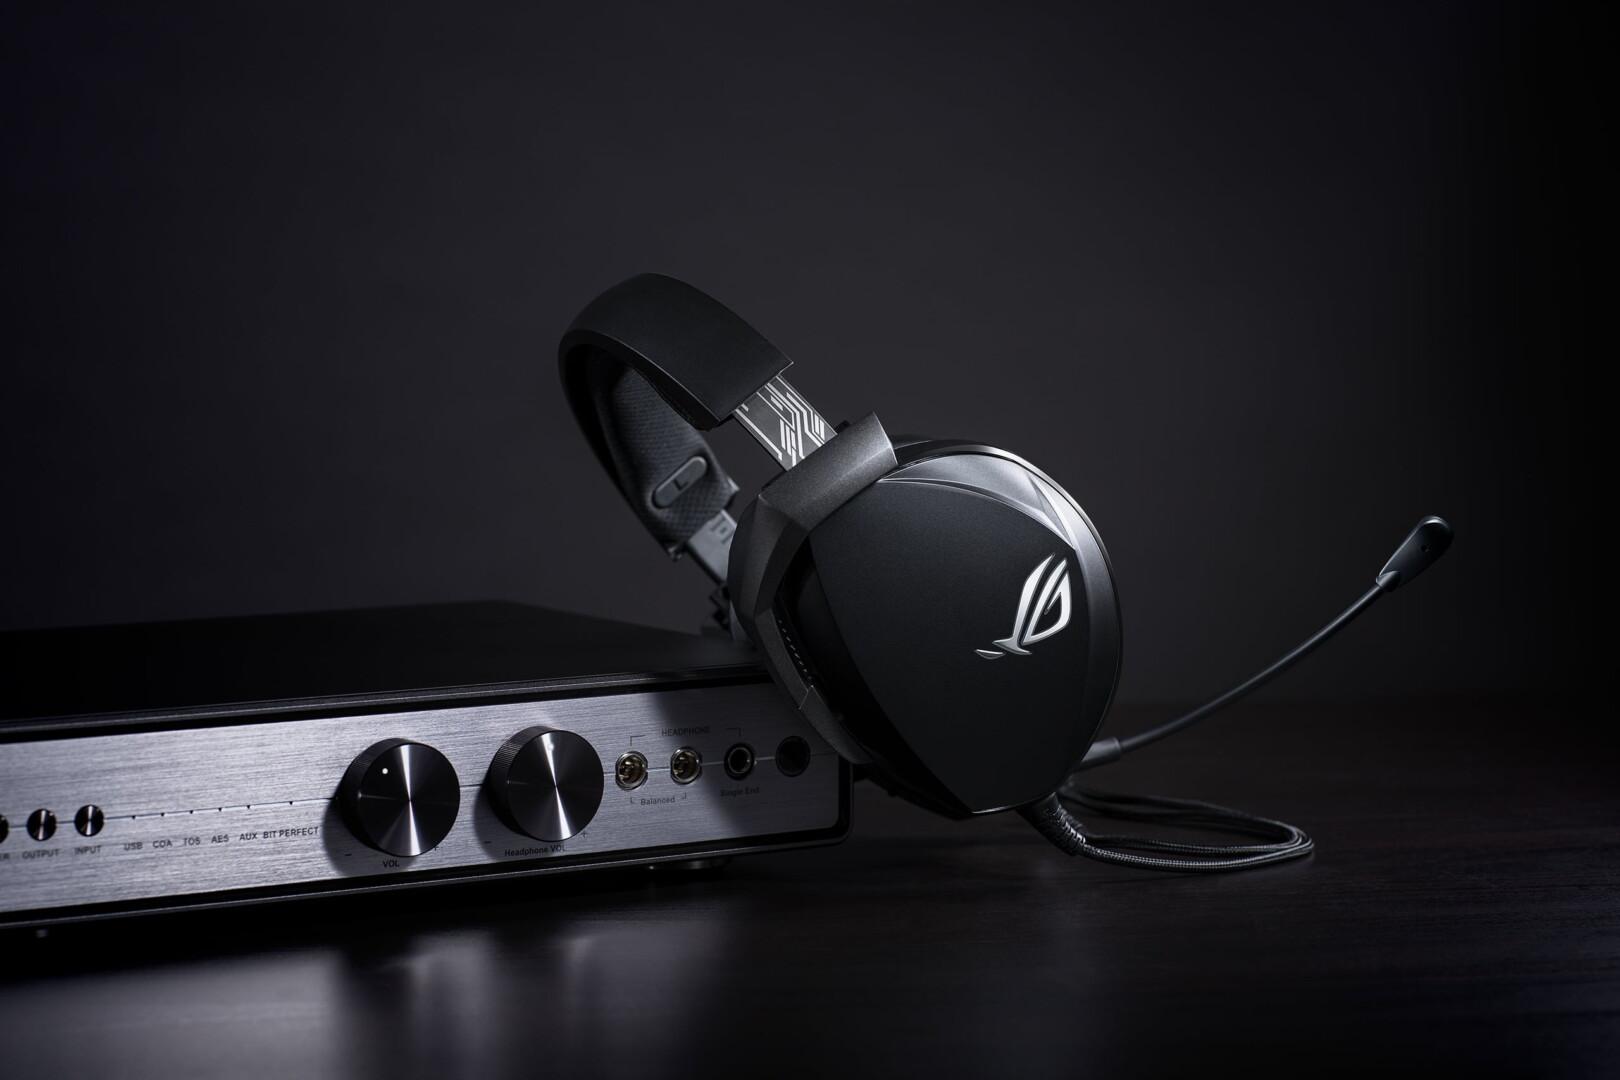 Rog Theta Electret: Presentate Le Cuffie Da Gaming Perfette Per Gli Audiofili 2 - Hynerd.it